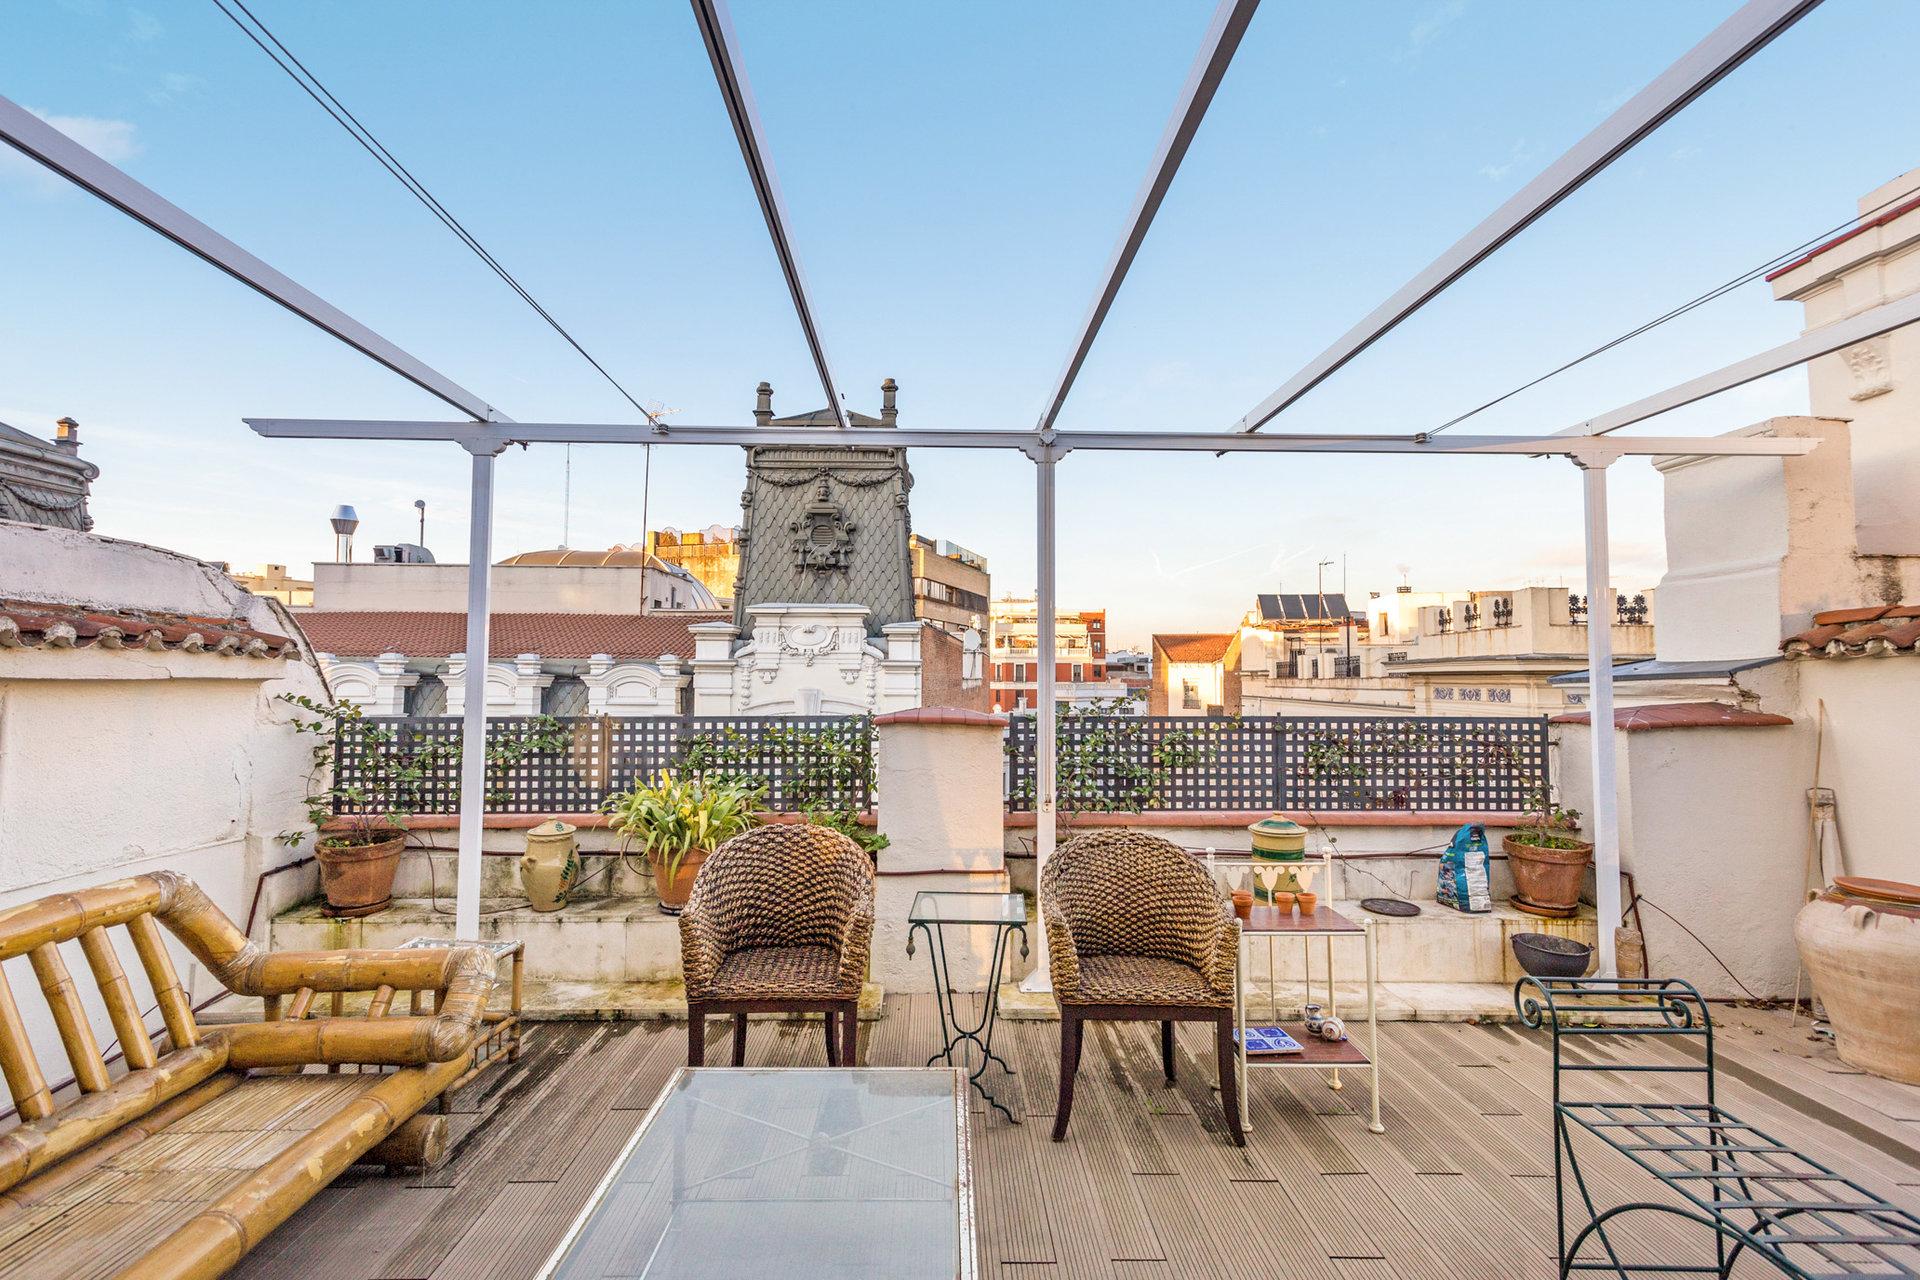 Ad Rental Apartment Madrid Almagro (28010) ref:L0940MA